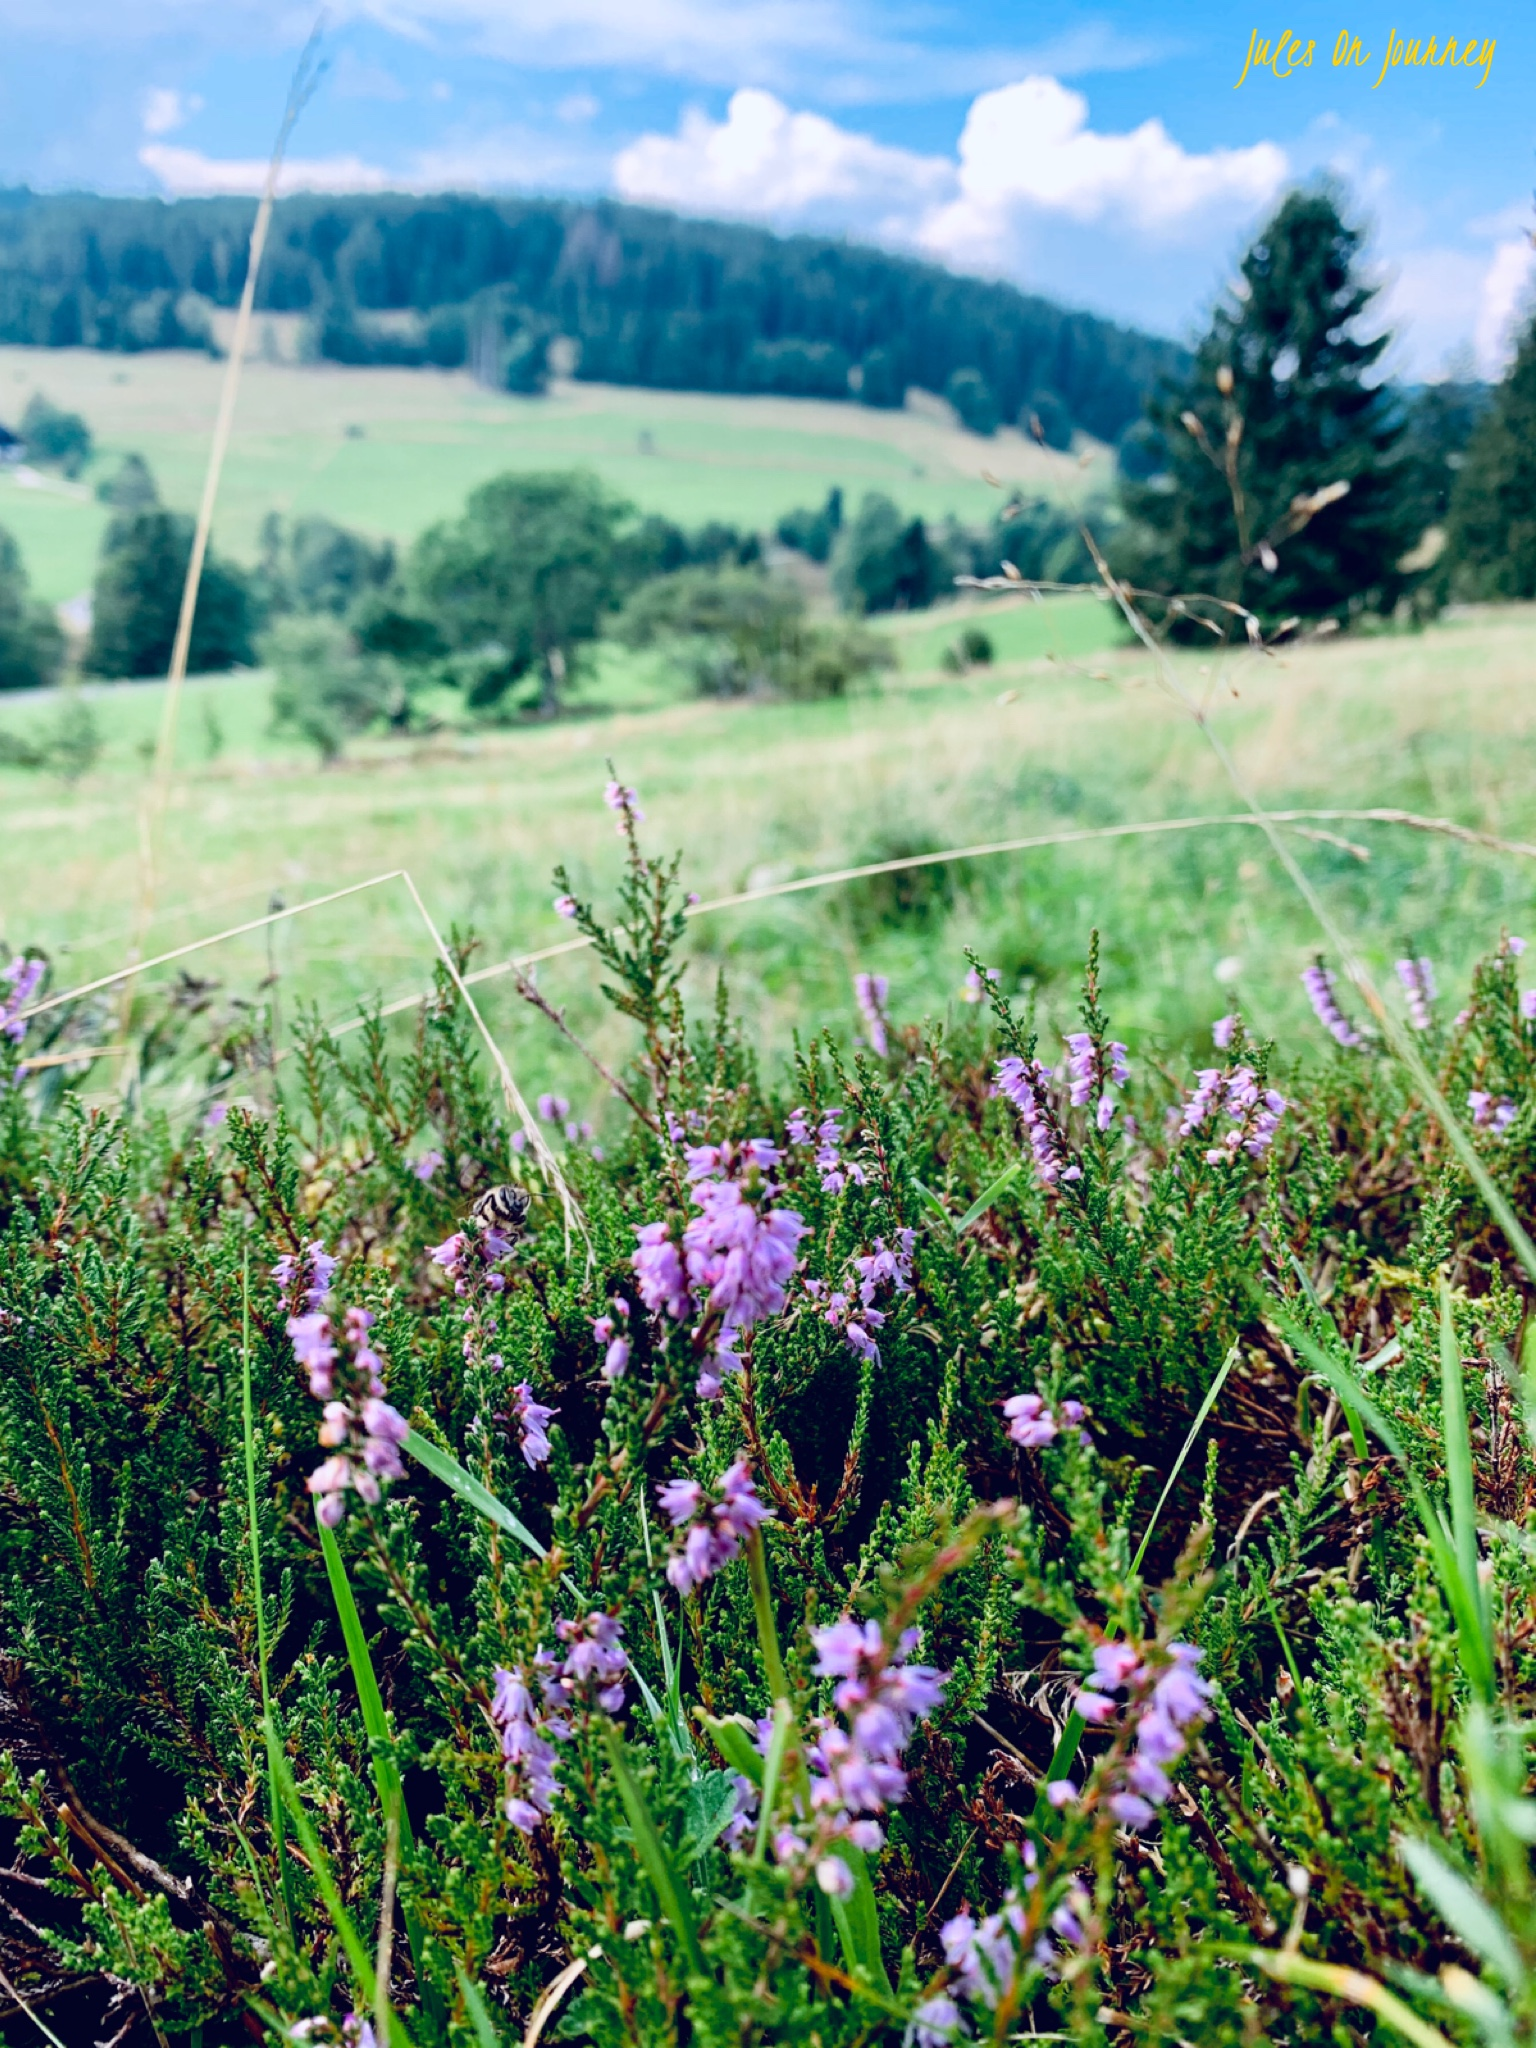 Blick ins grüne Tal